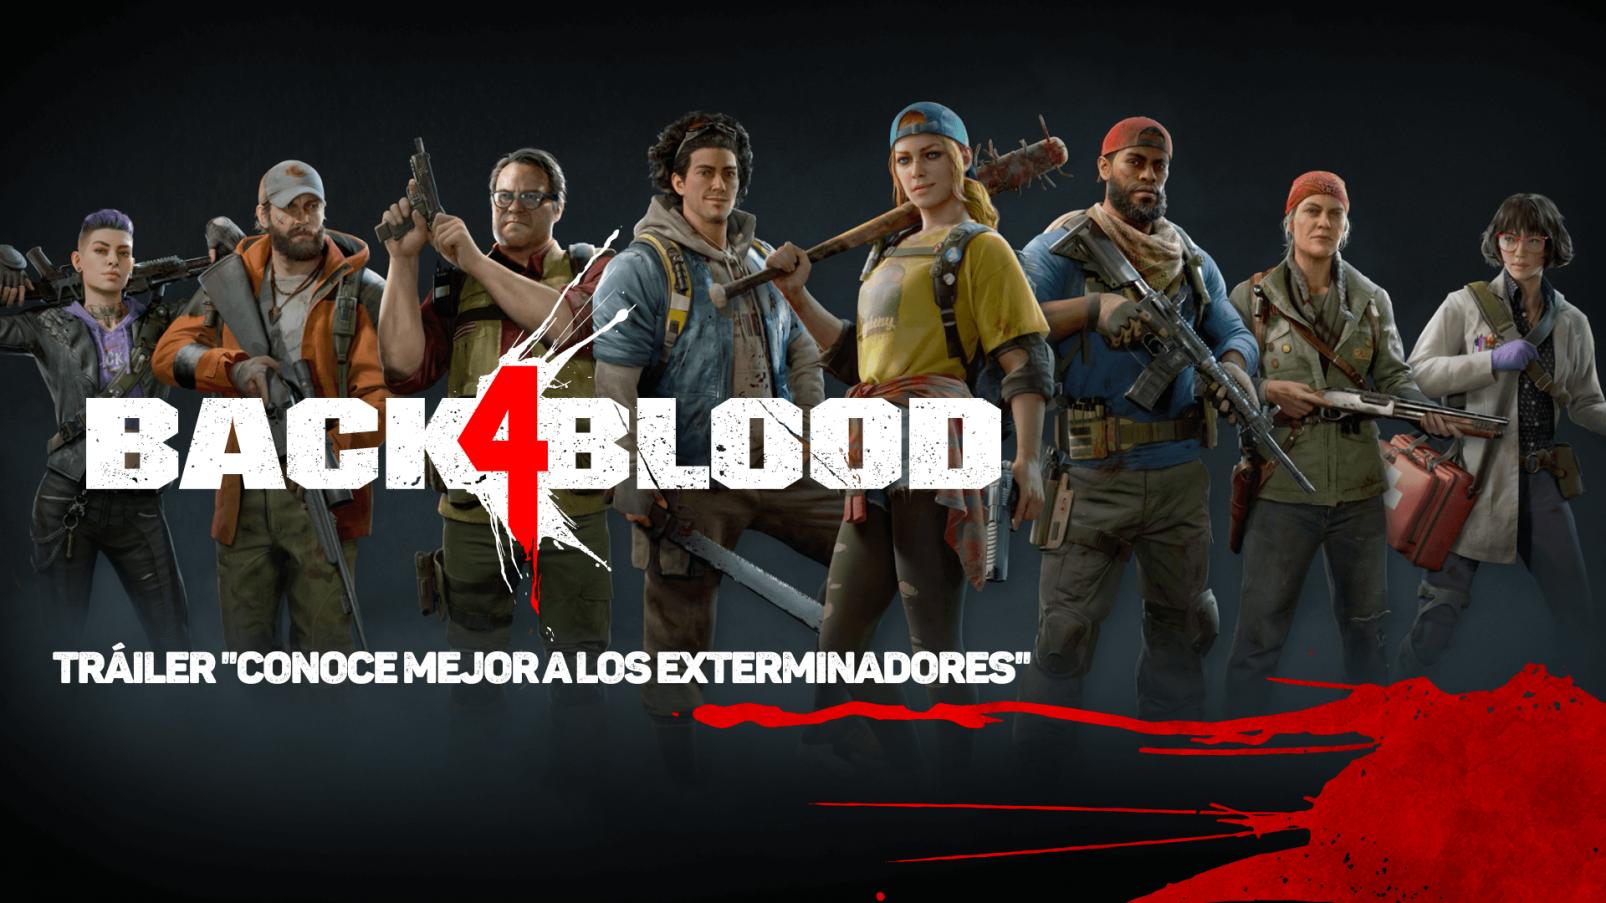 exterminadores de Back 4 Blood